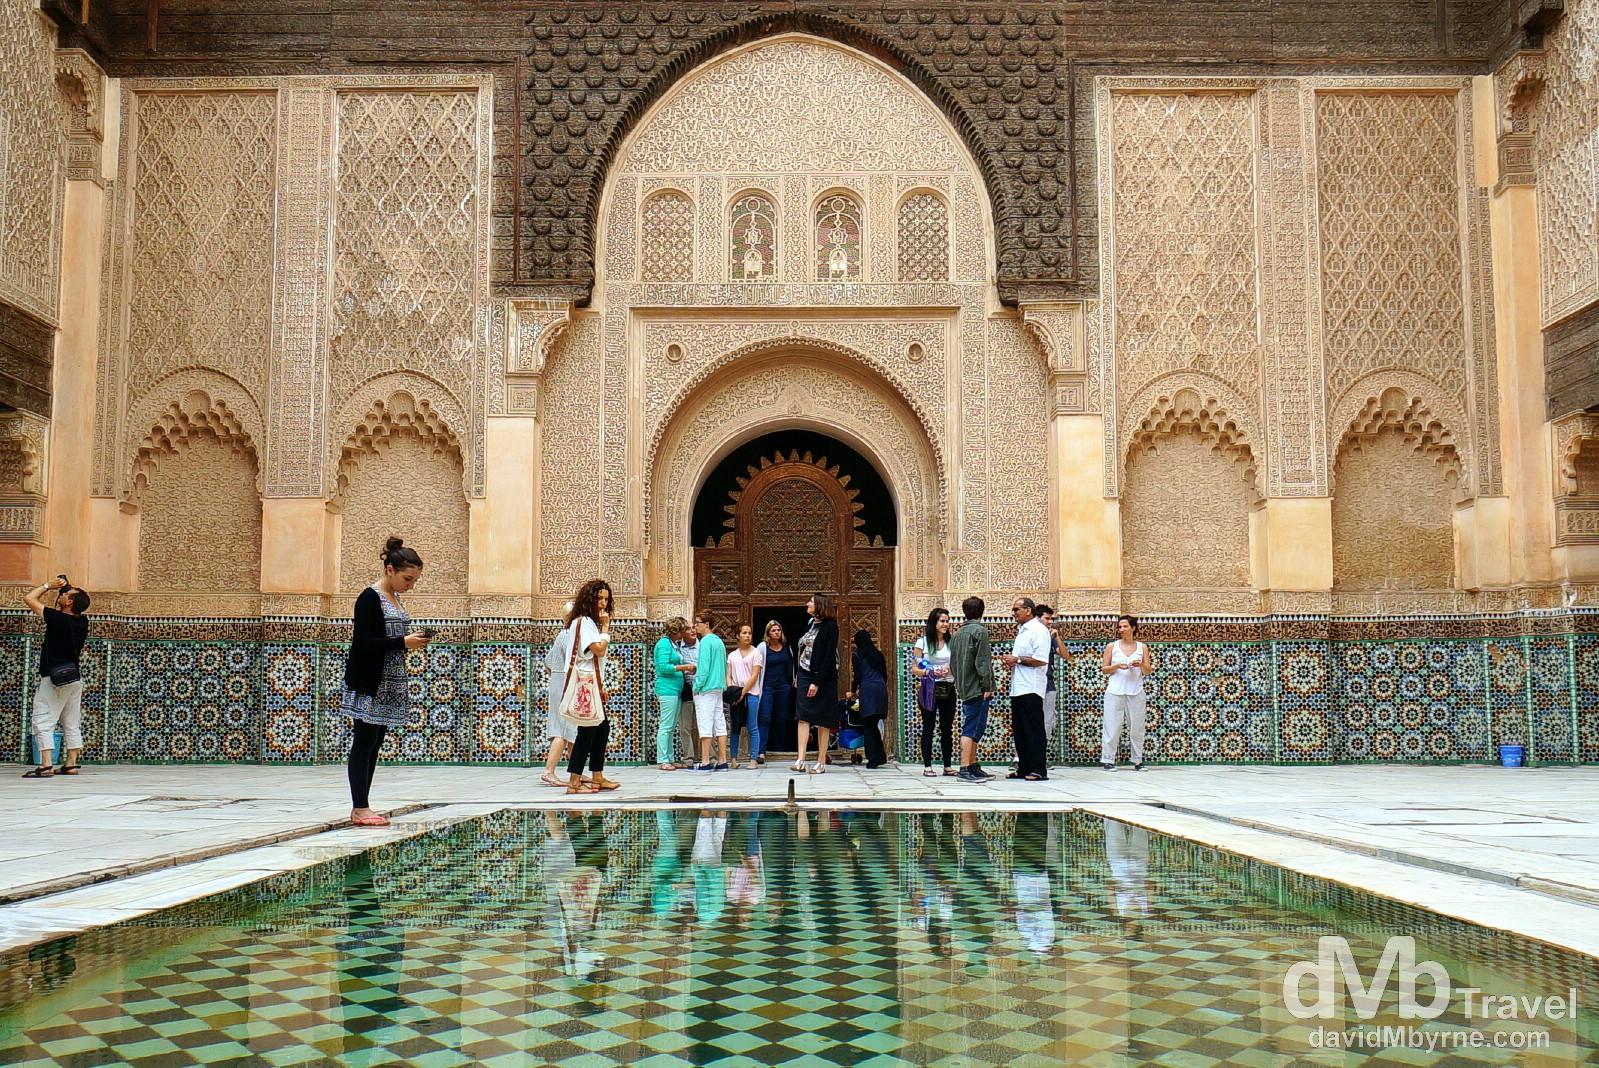 Ali ben Youssef Medersa, Marrakesh, Morocco. May 6th, 2014.